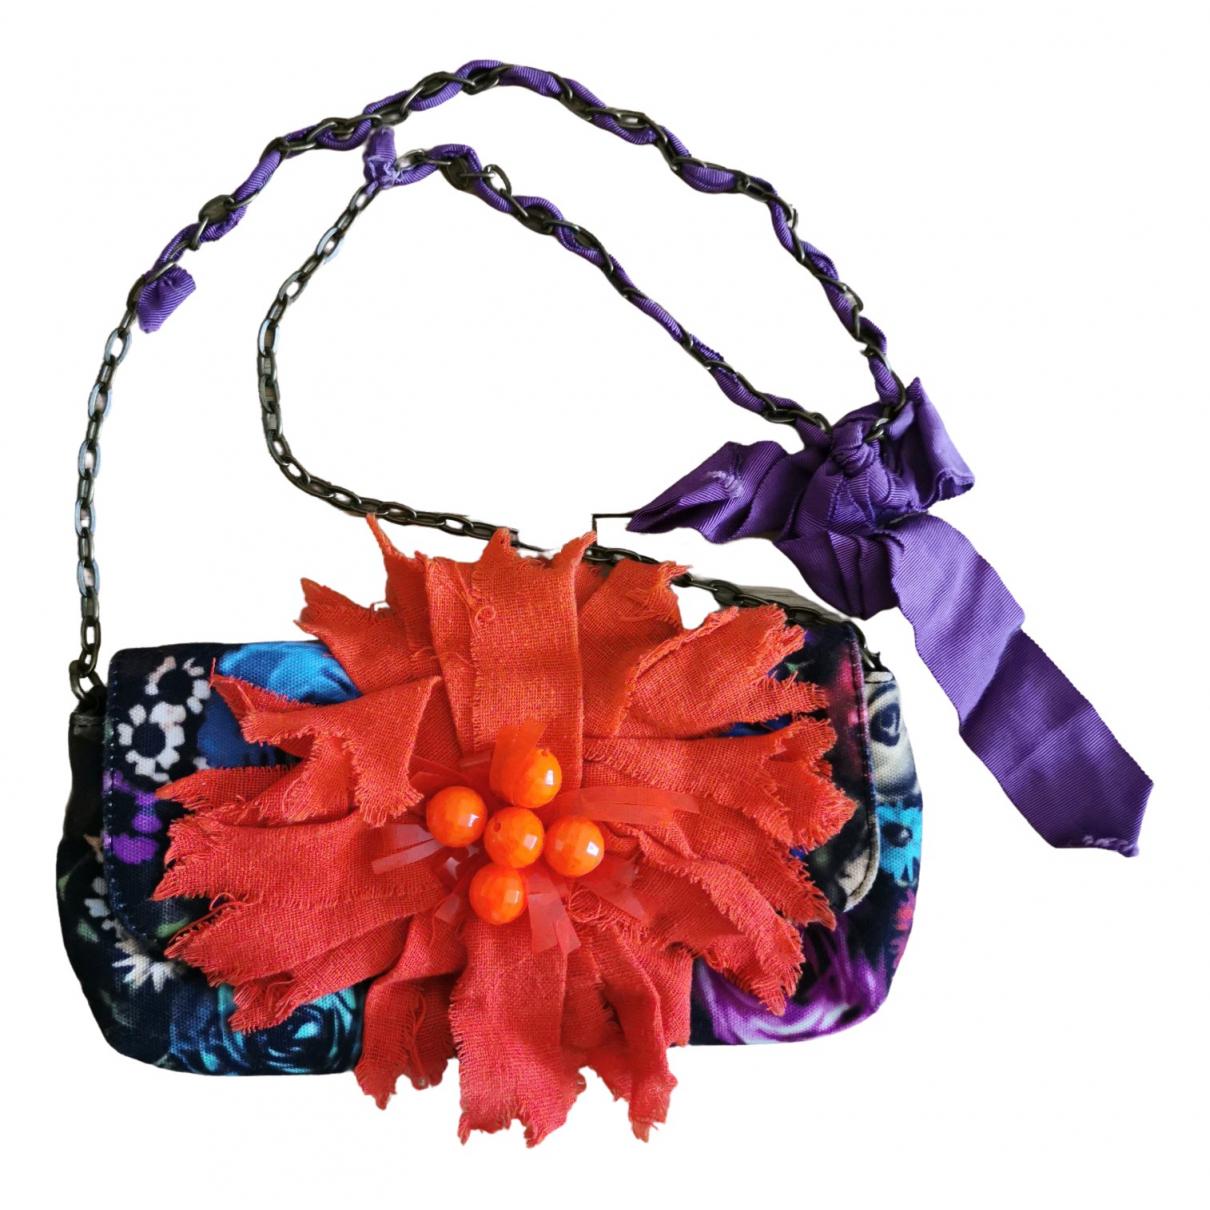 Lanvin For H&m \N Purple Cotton Clutch bag for Women \N